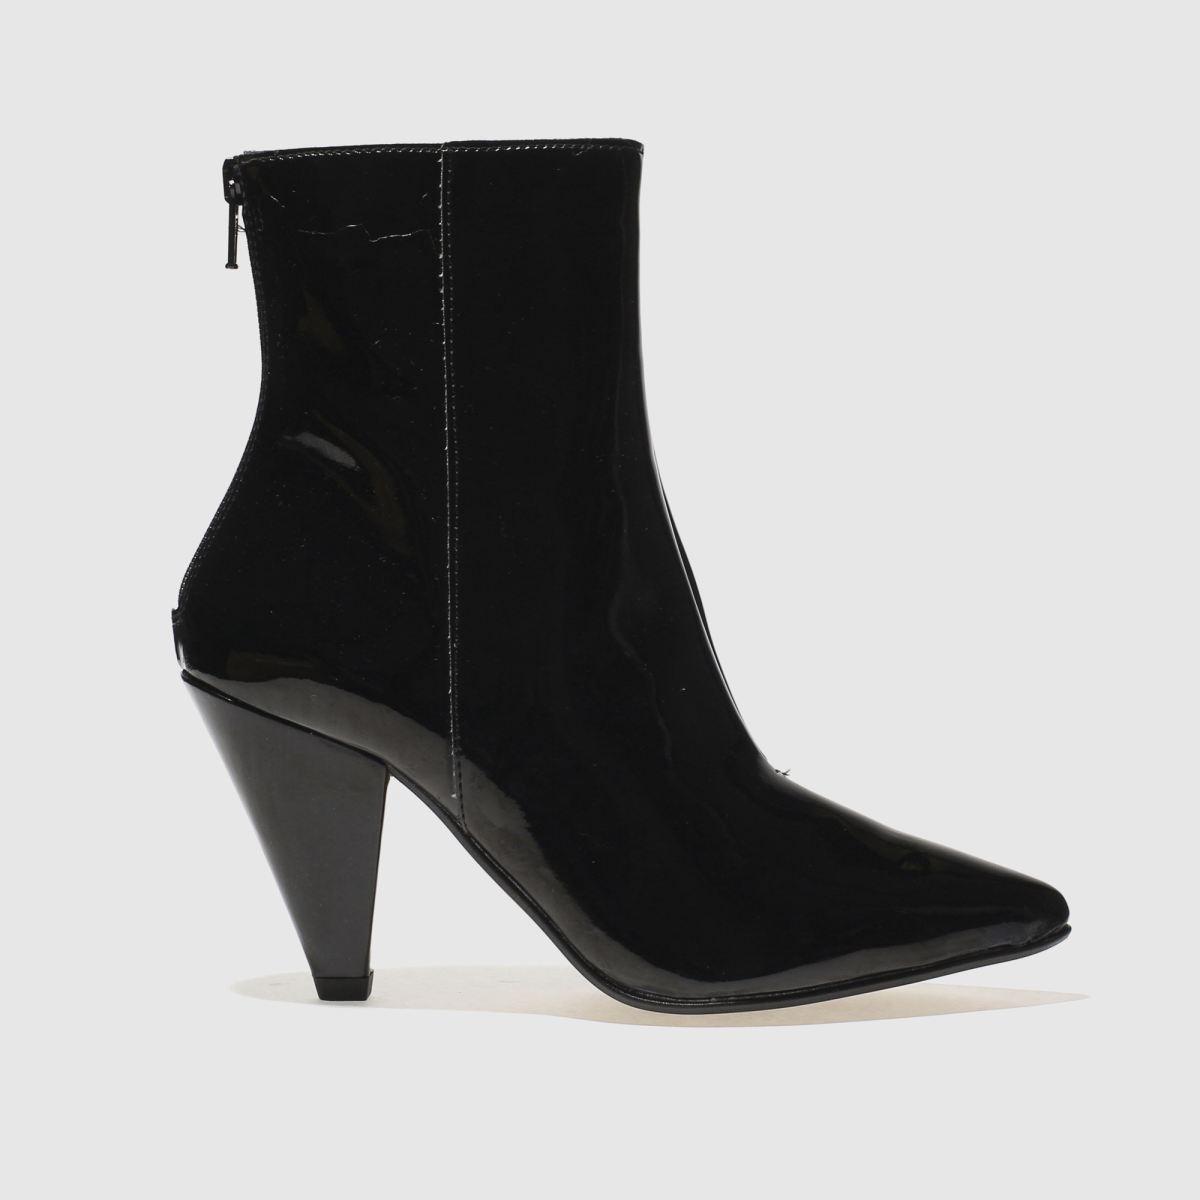 schuh black judgement boots